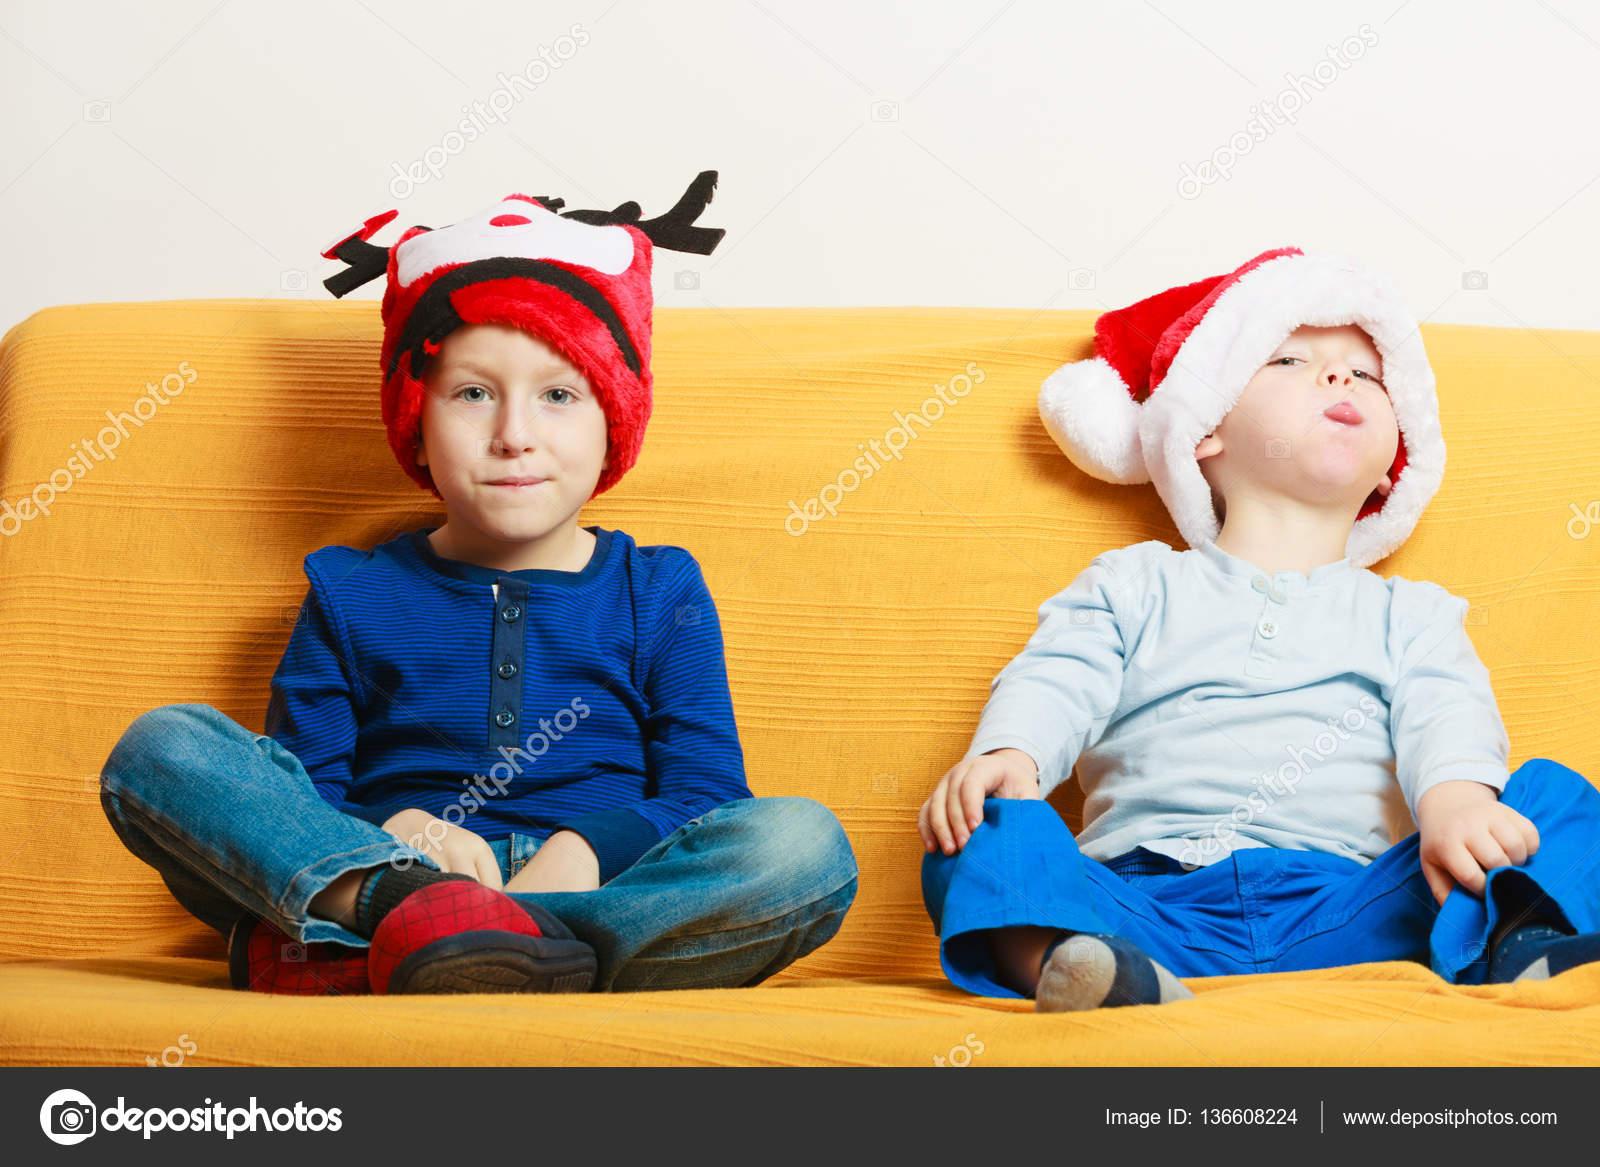 Two boys in sofa